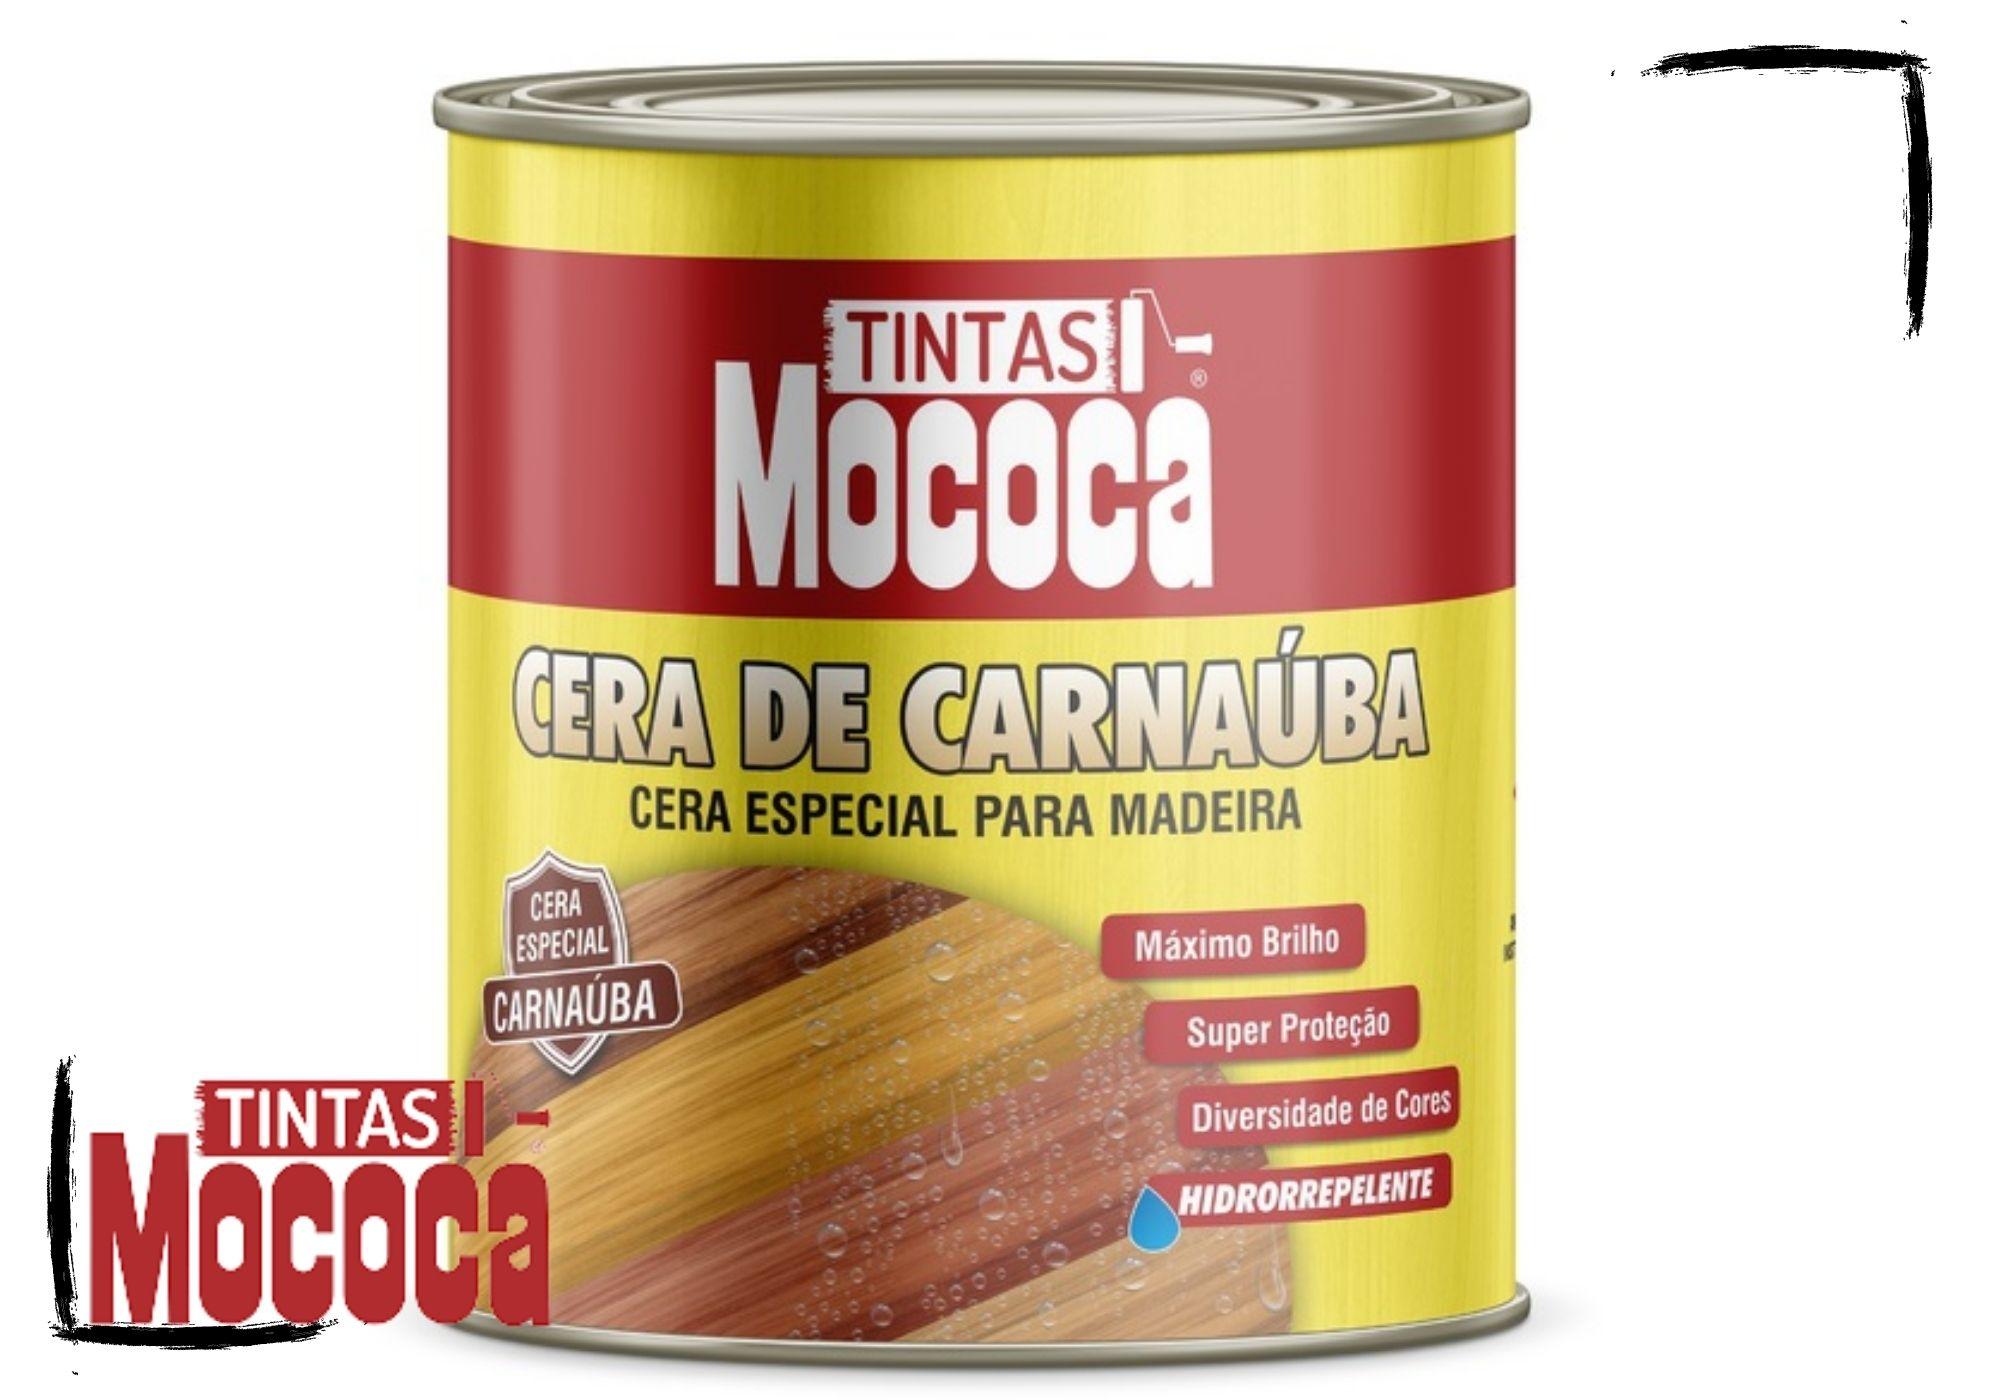 Cera de Carnaúba Especial Para Madeiras (Cores) Mococa